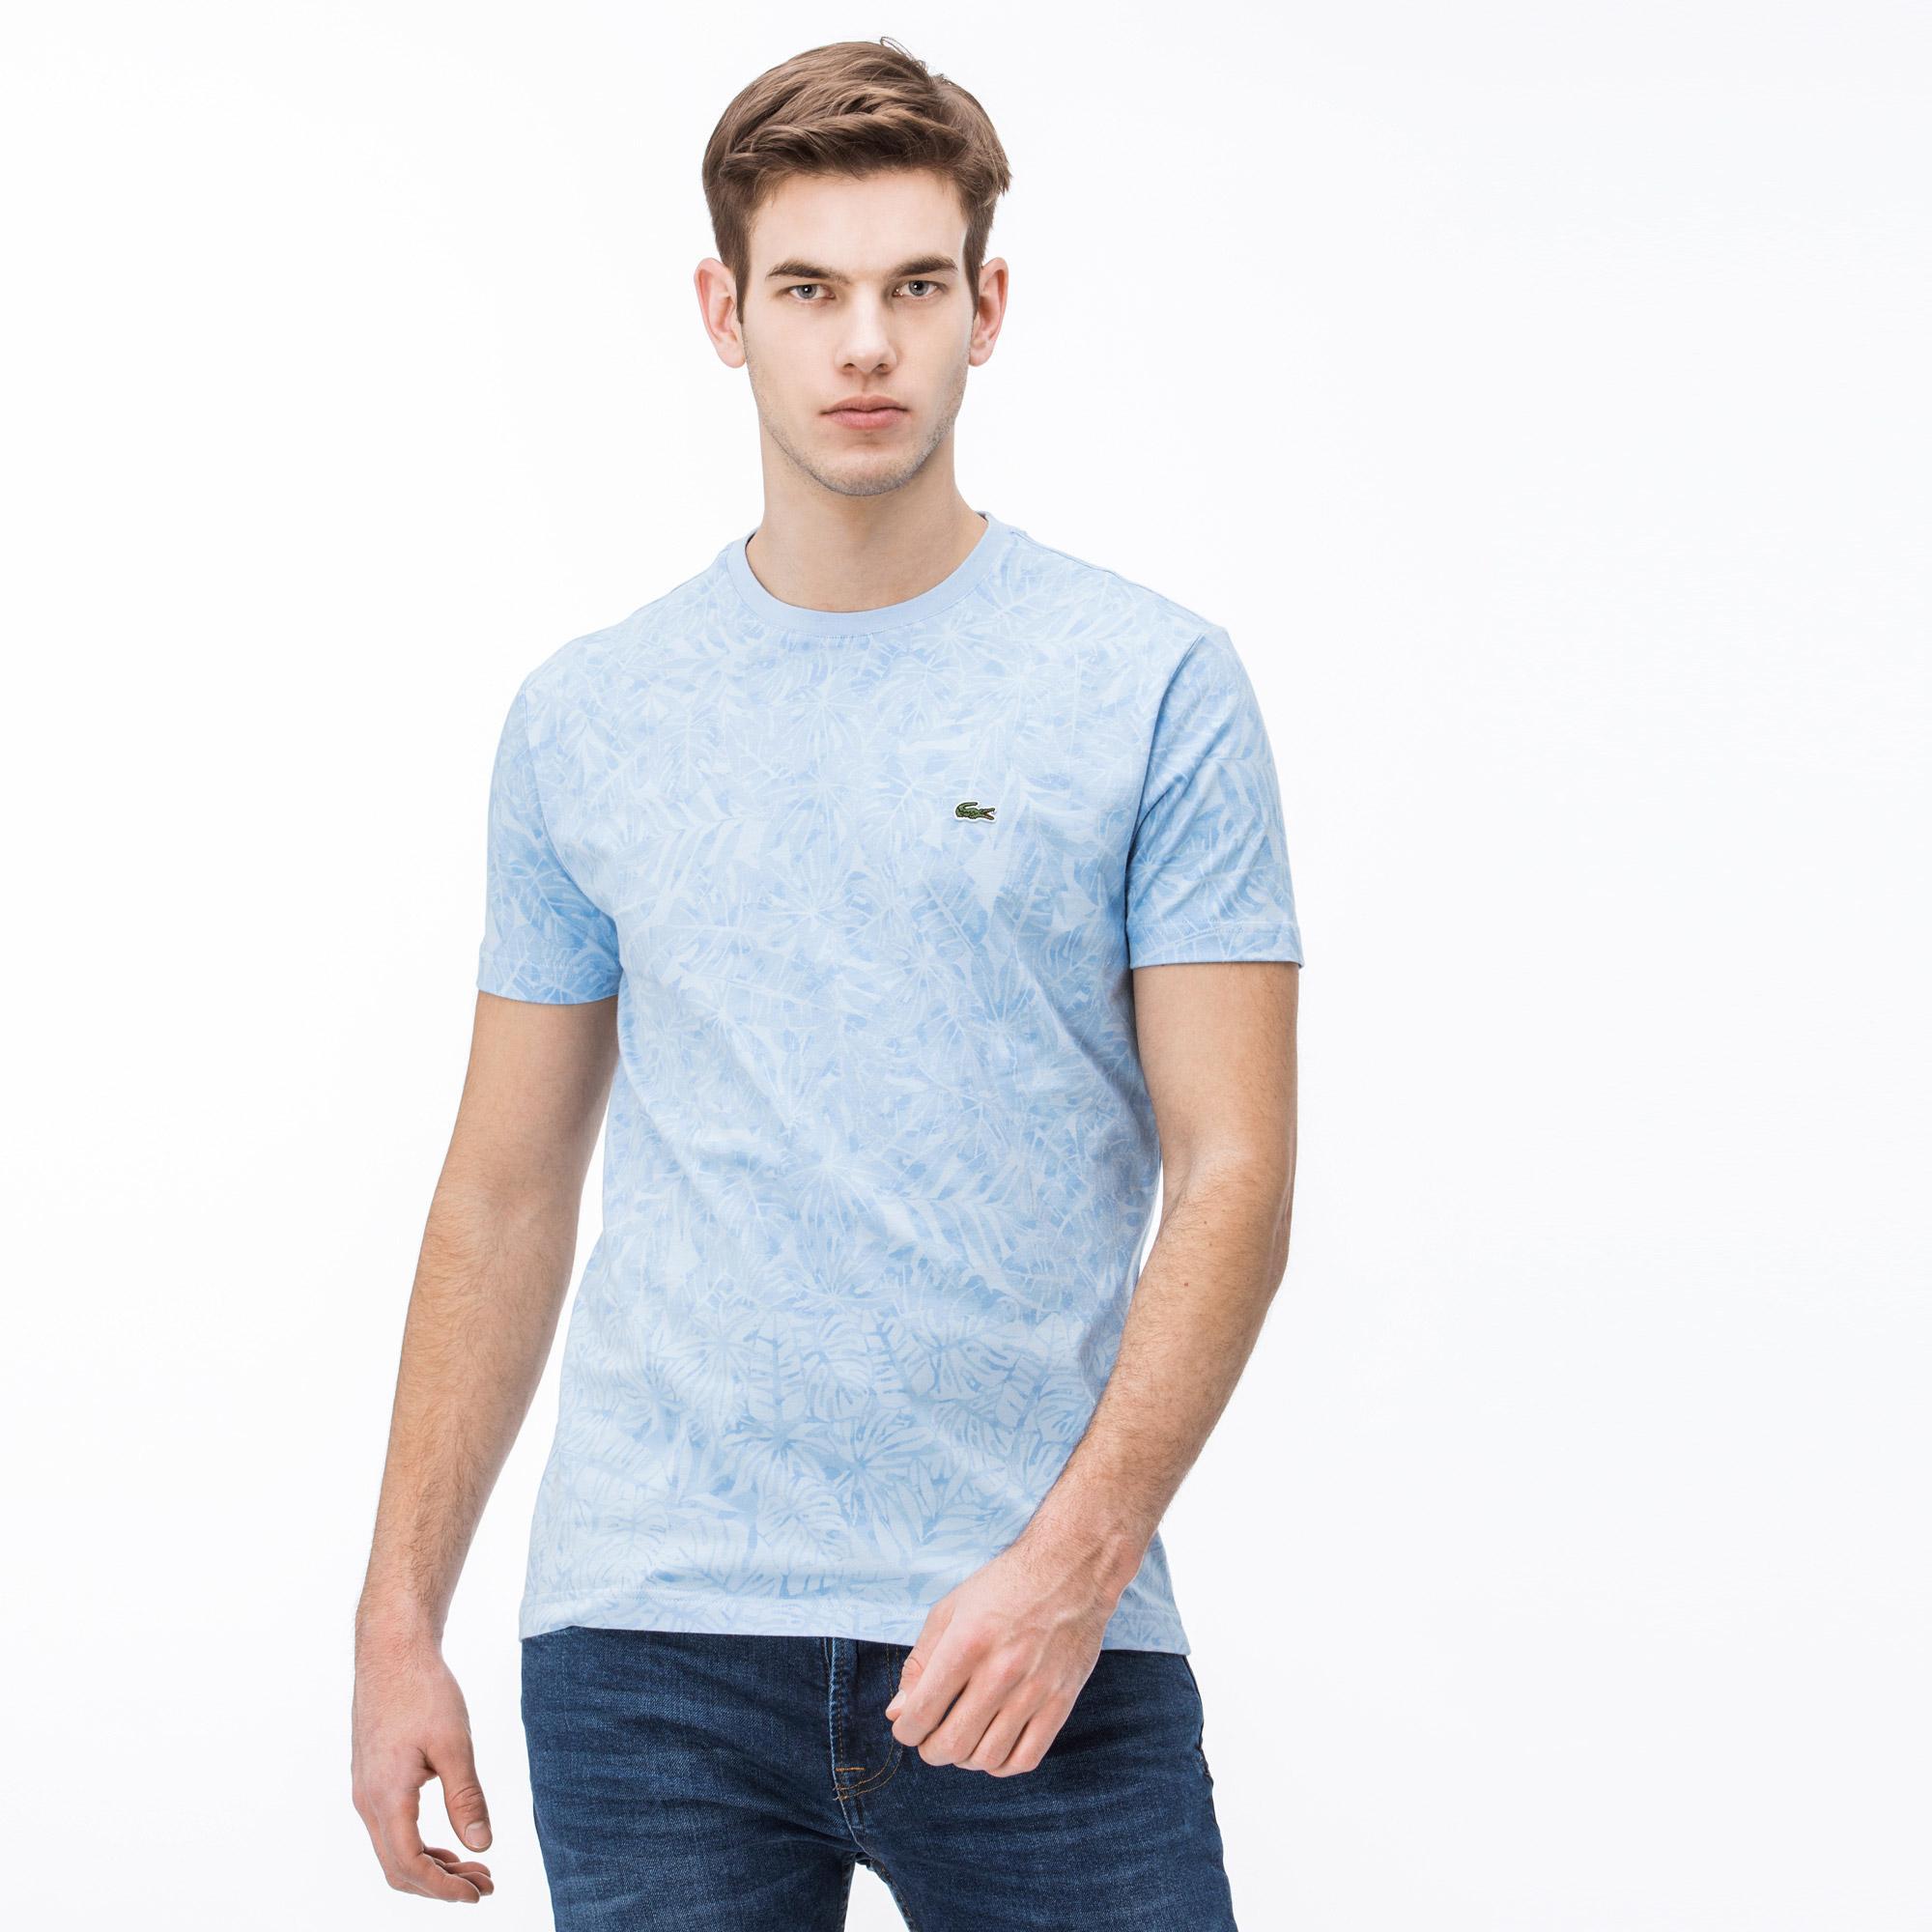 Lacoste Erkek Slim Fit Bej T-Shirt